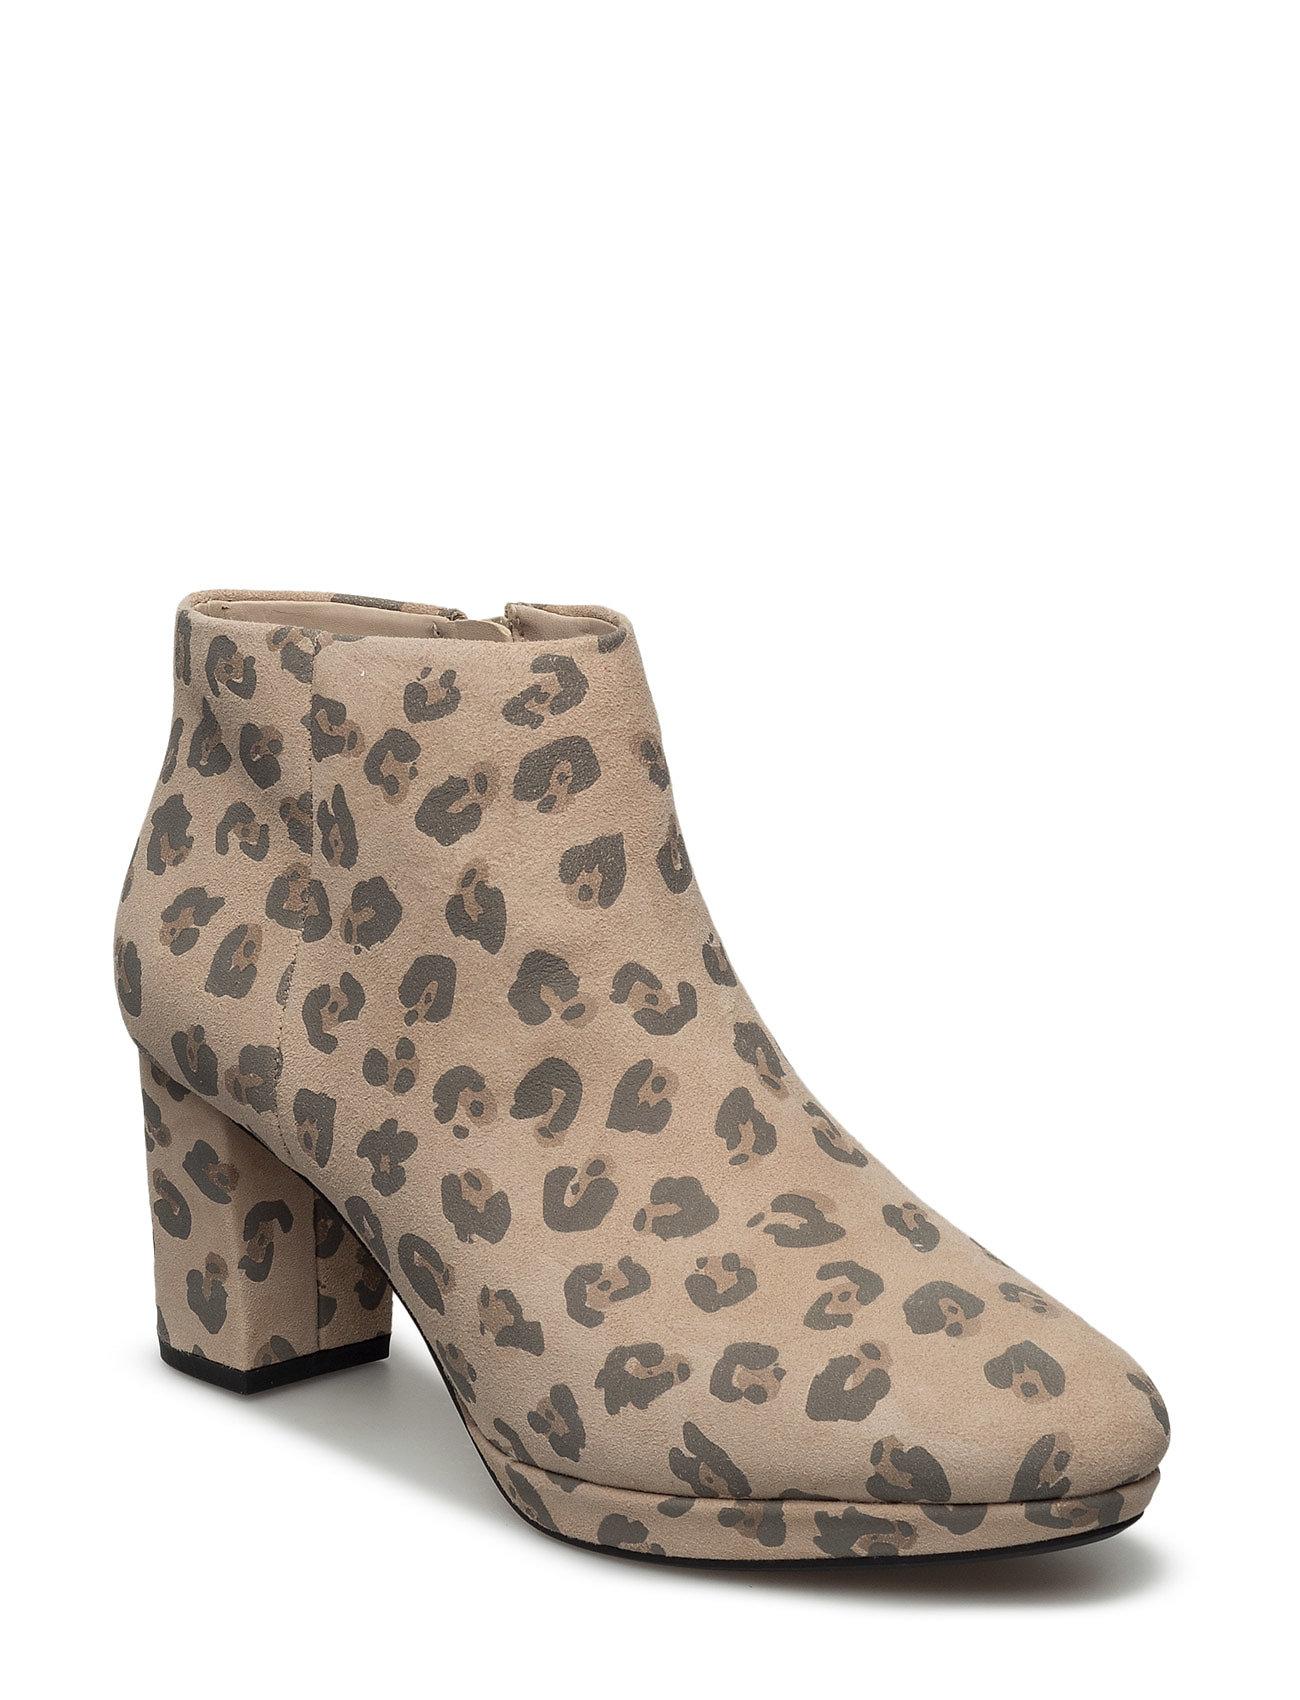 Kelda Nights Clarks Støvler til Damer i